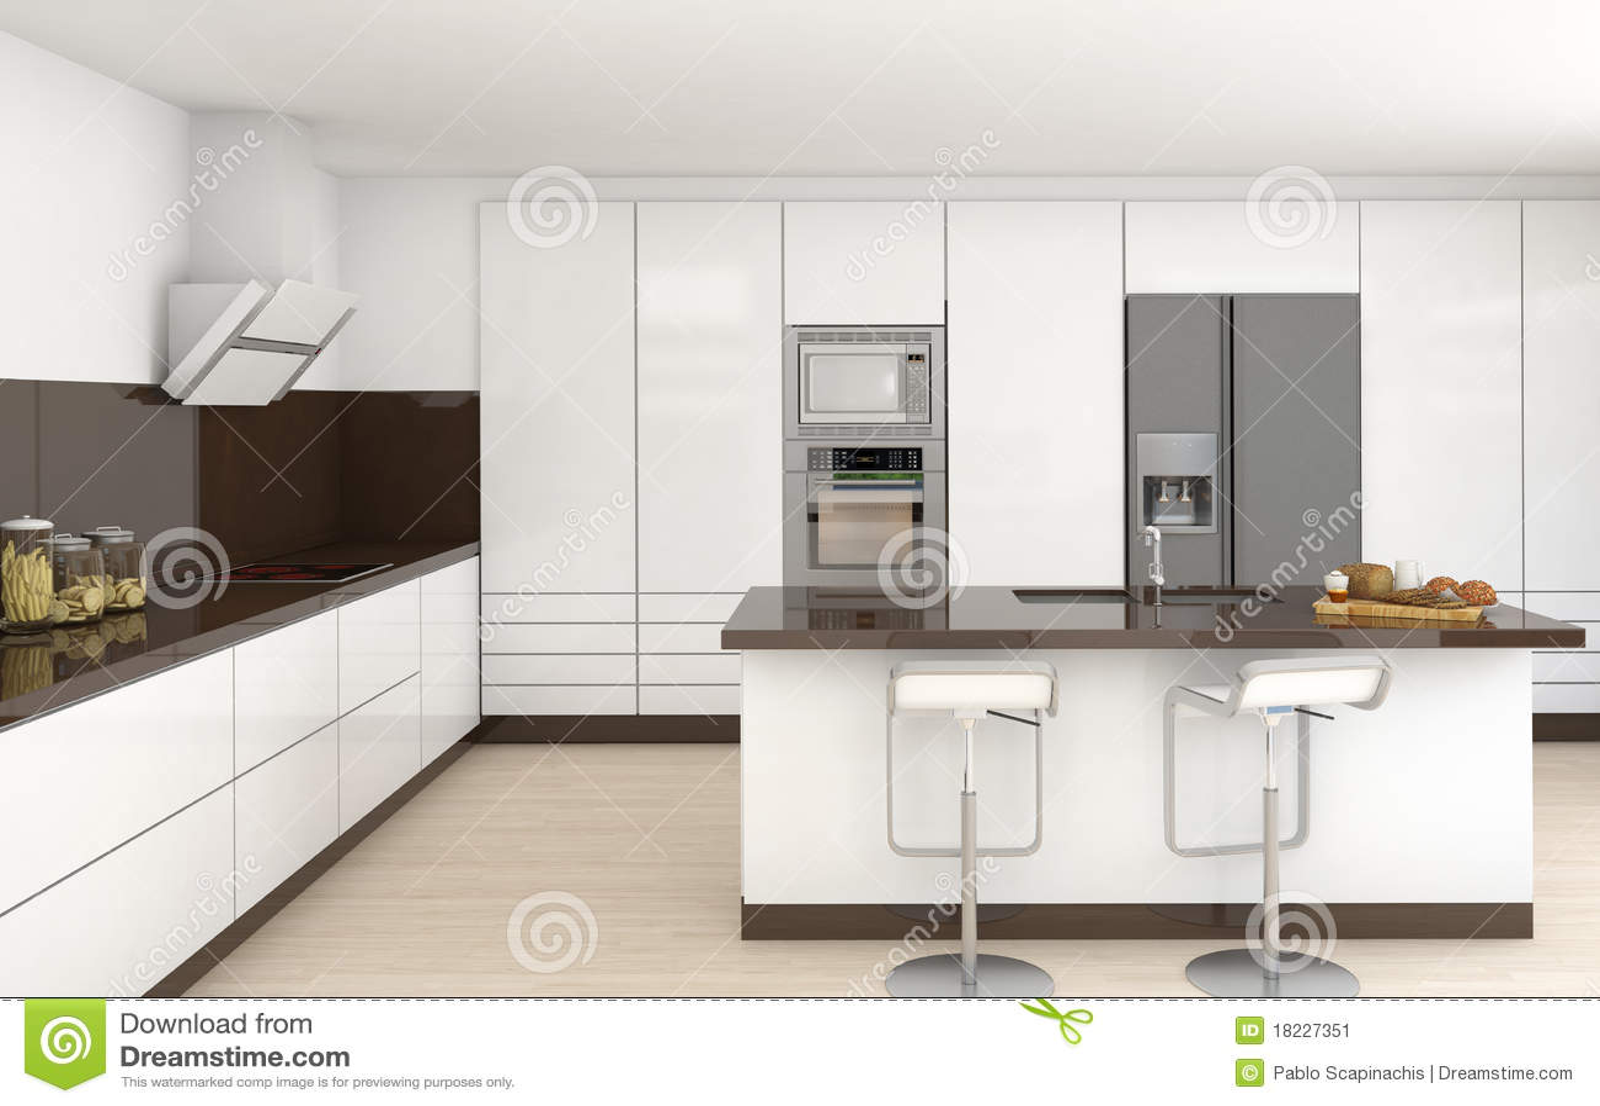 Cucina bianca e marrone interna immagine stock immagine 18227351 - Cucina bianca e marrone ...